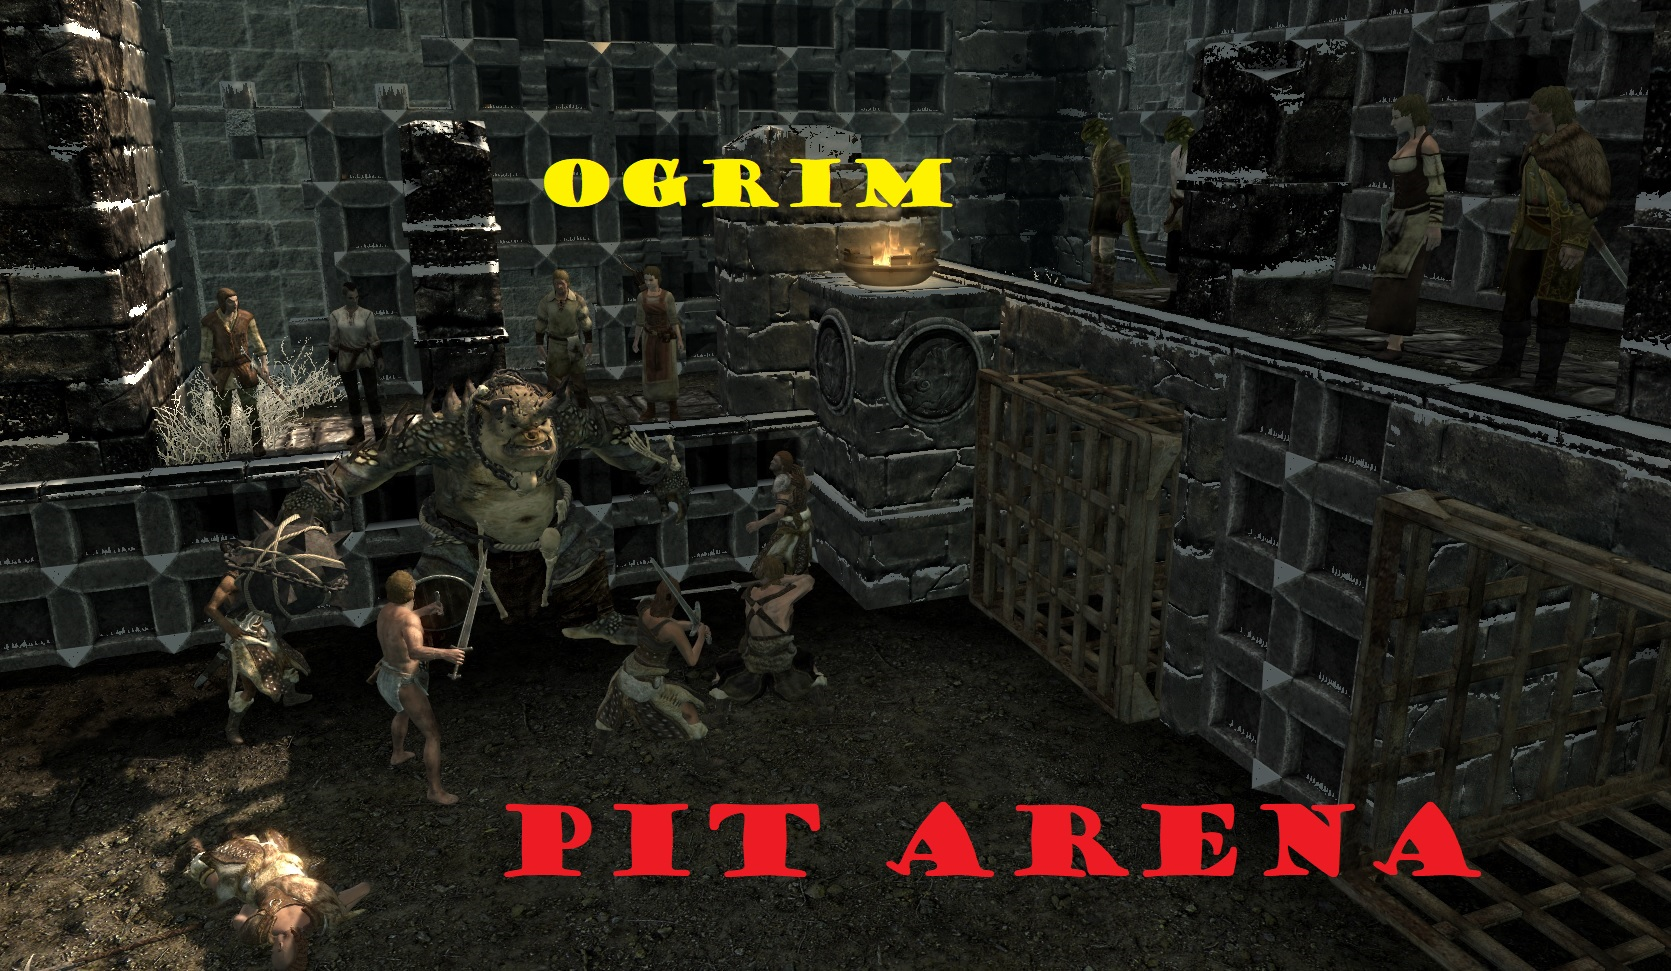 Pit Arena Ogrim 2